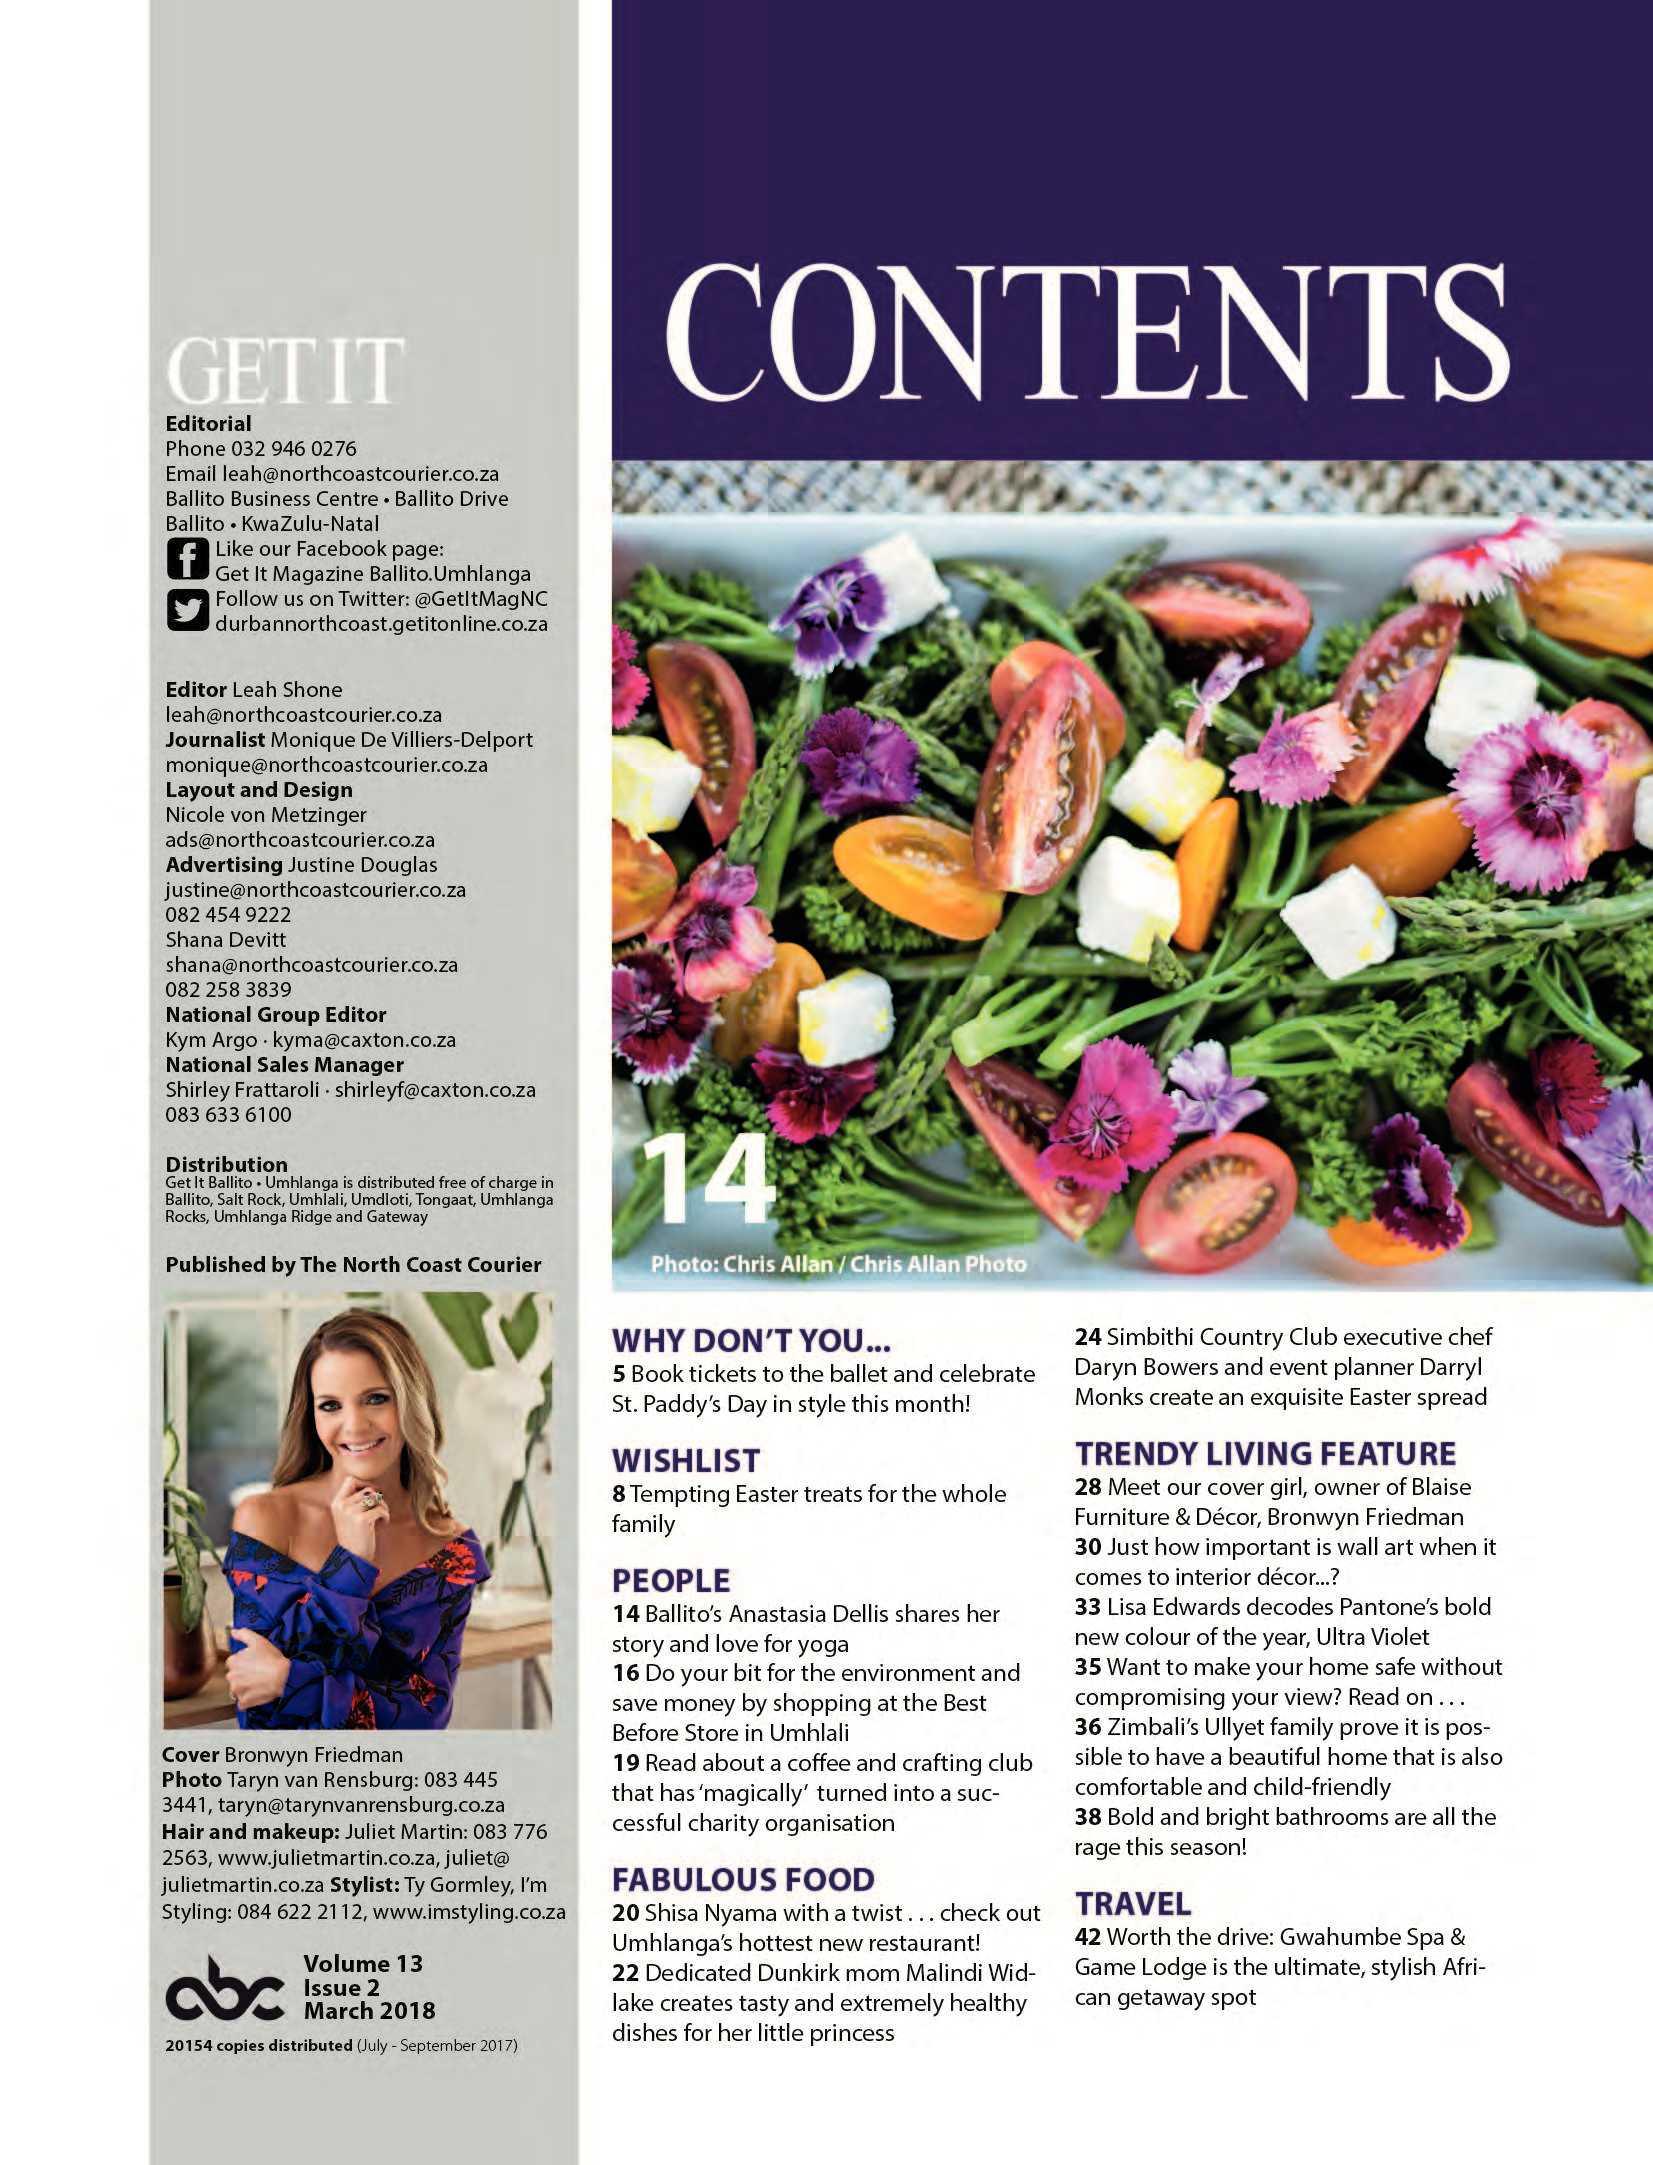 get-magazine-ballitoumhlanga-march-2018-epapers-page-5